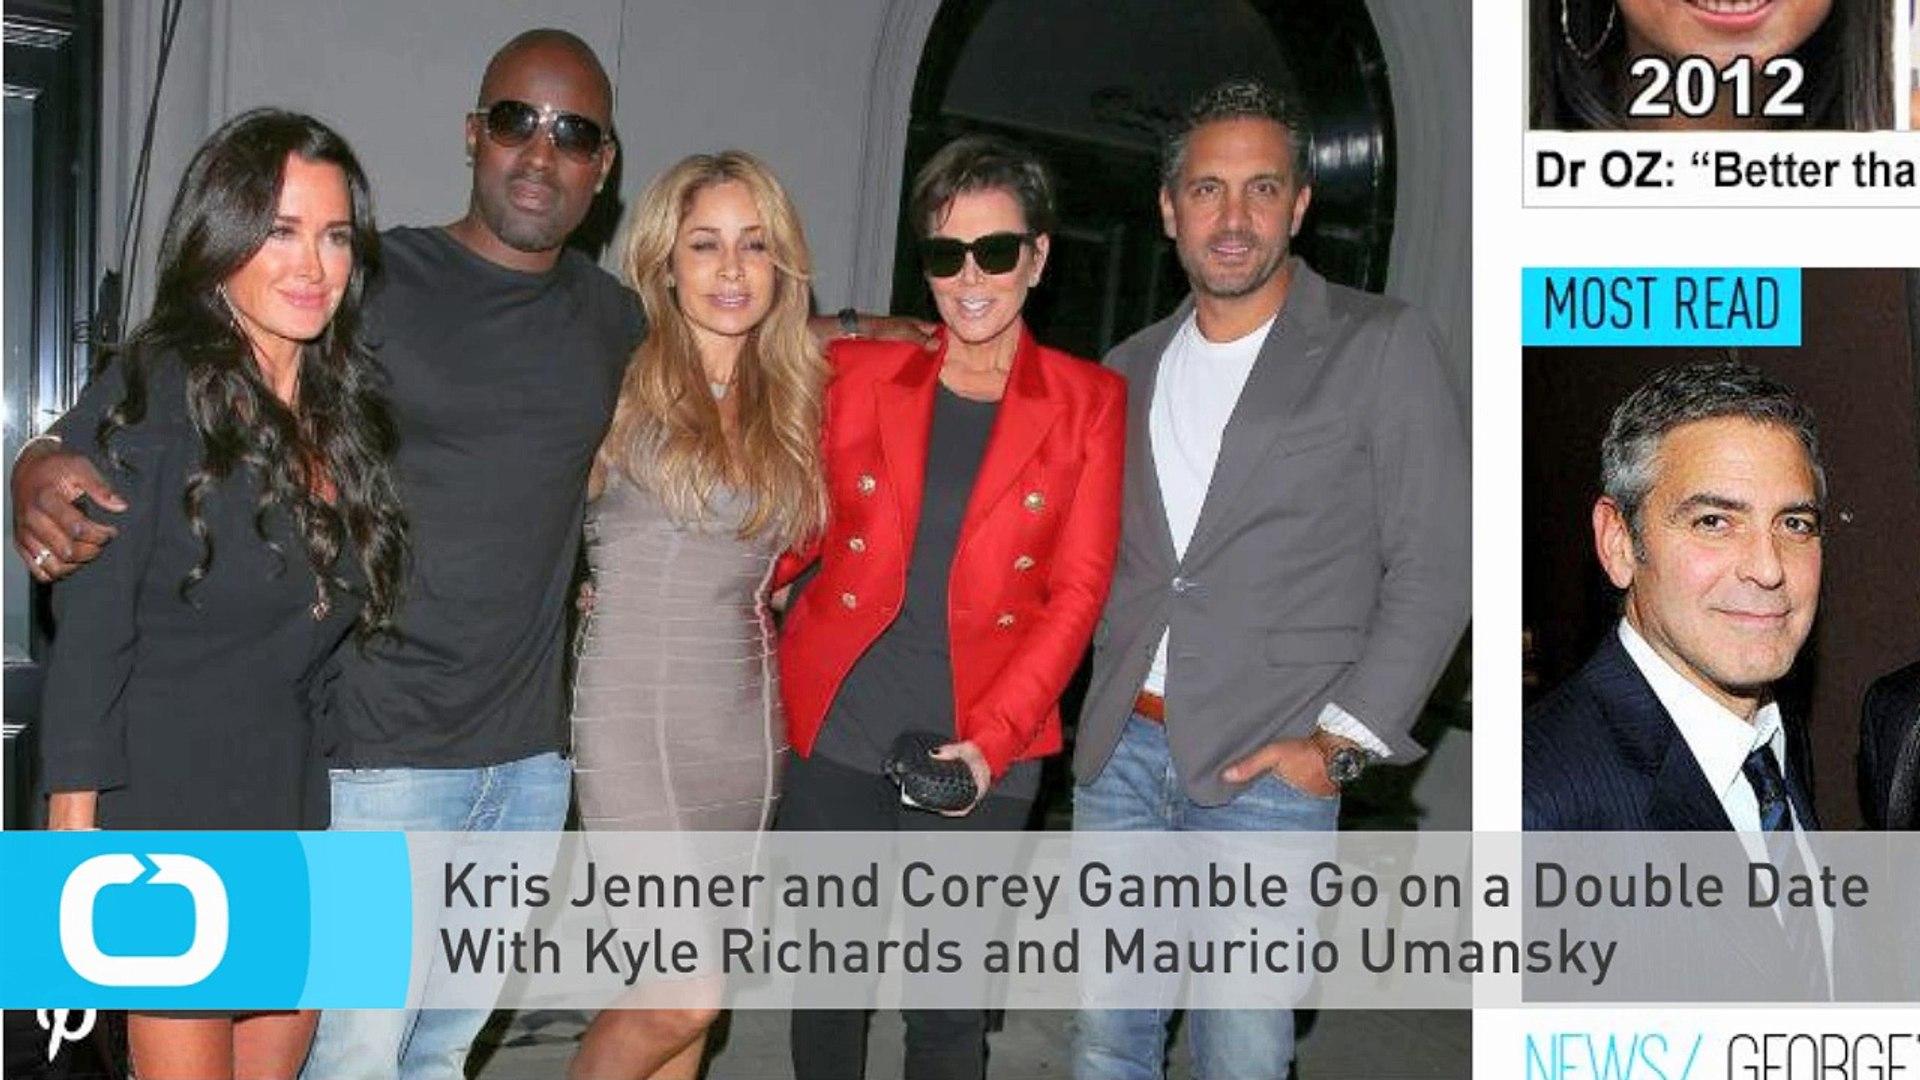 Kris Jenner en Corey dating CE Este speed dating